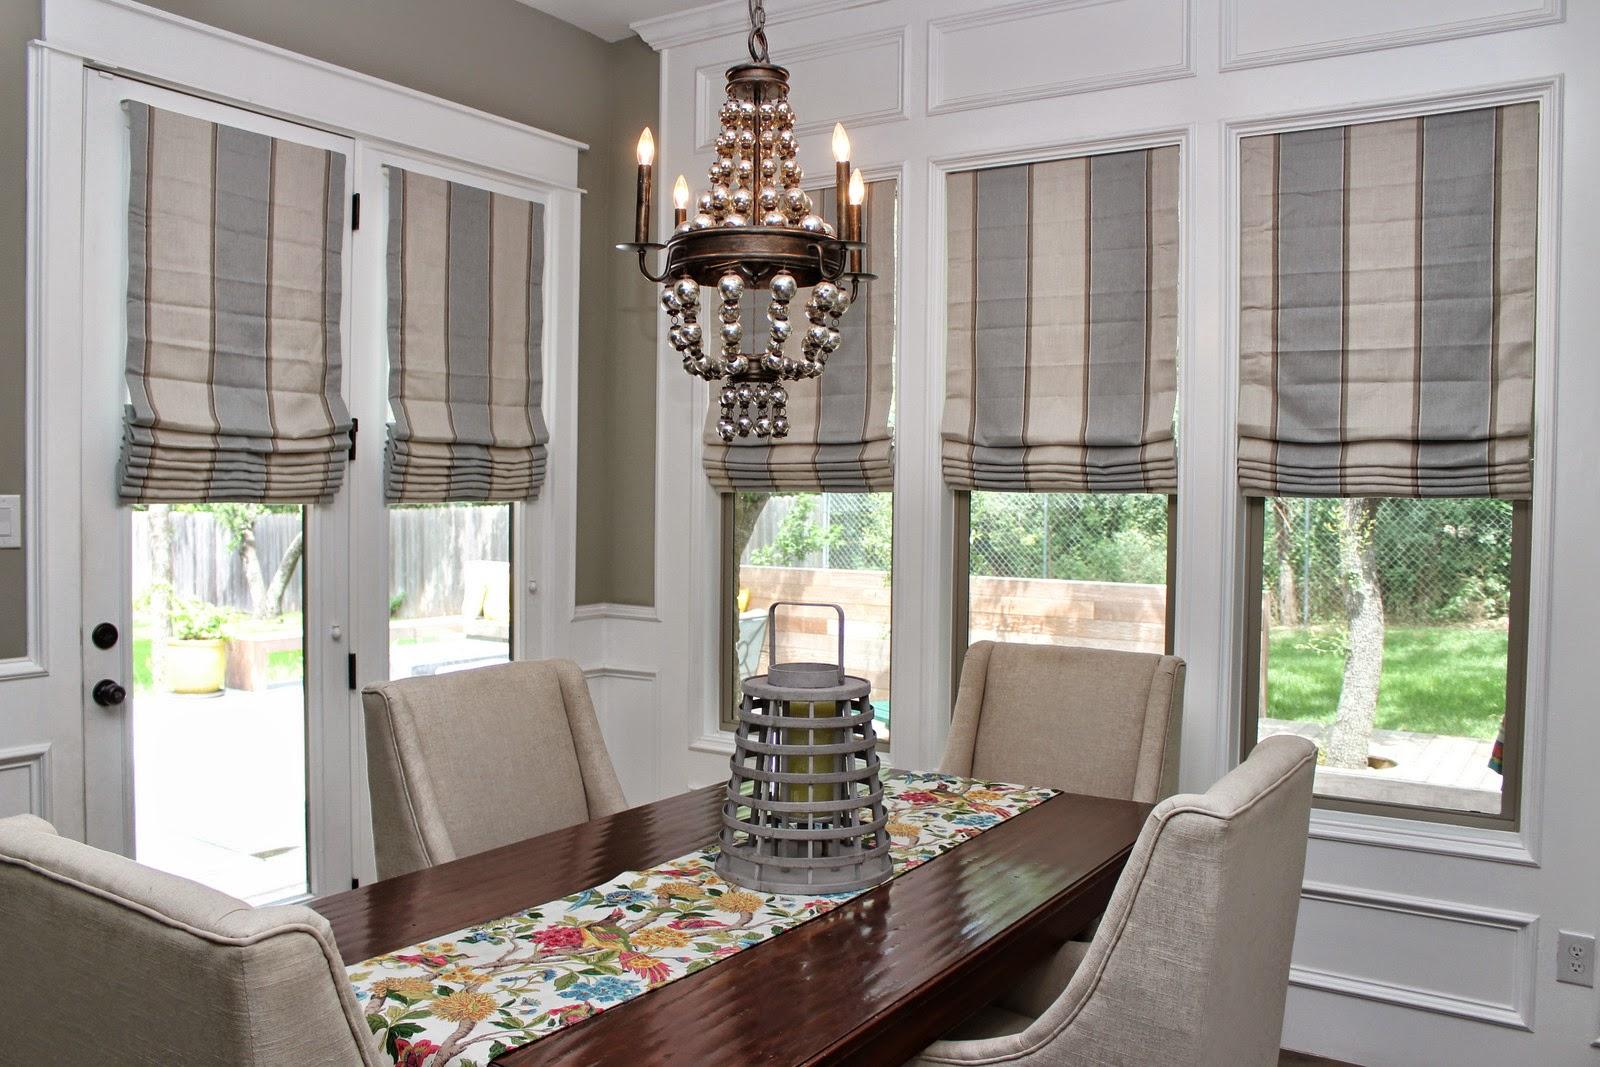 Contemporary Design. Contemporary Design In Window Coverings ...